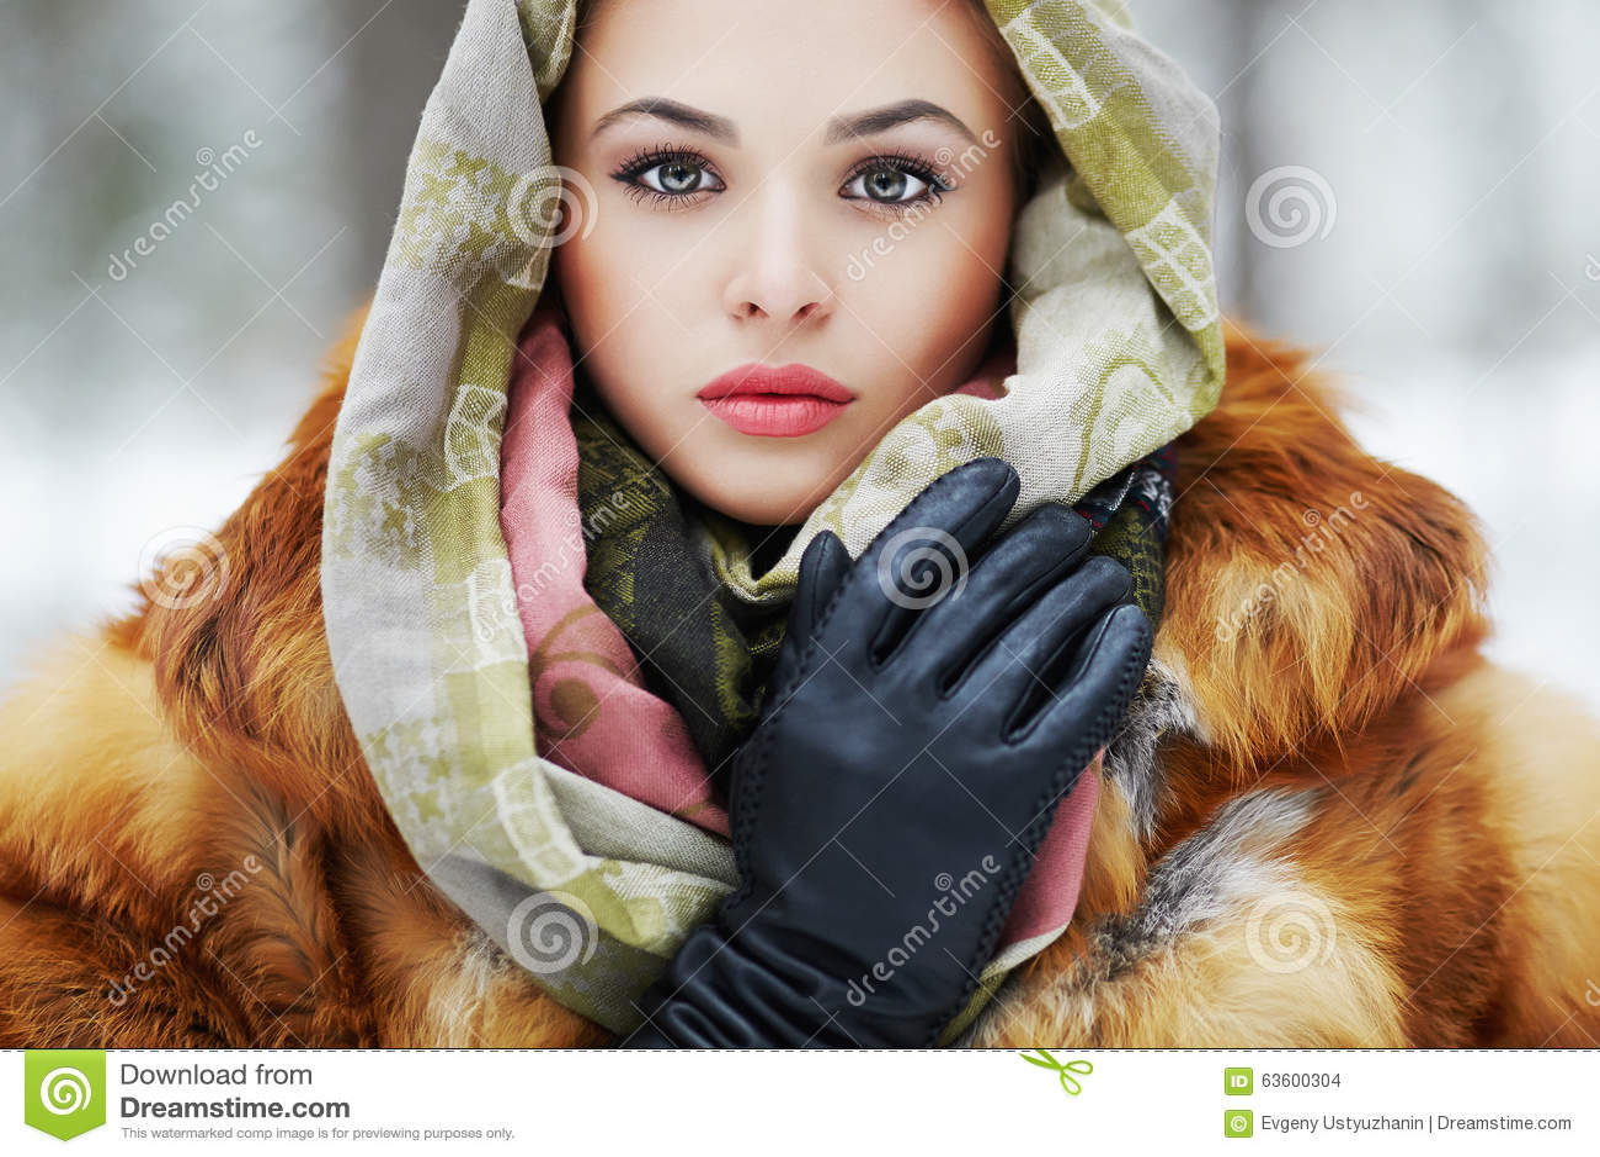 girl Siberian models young